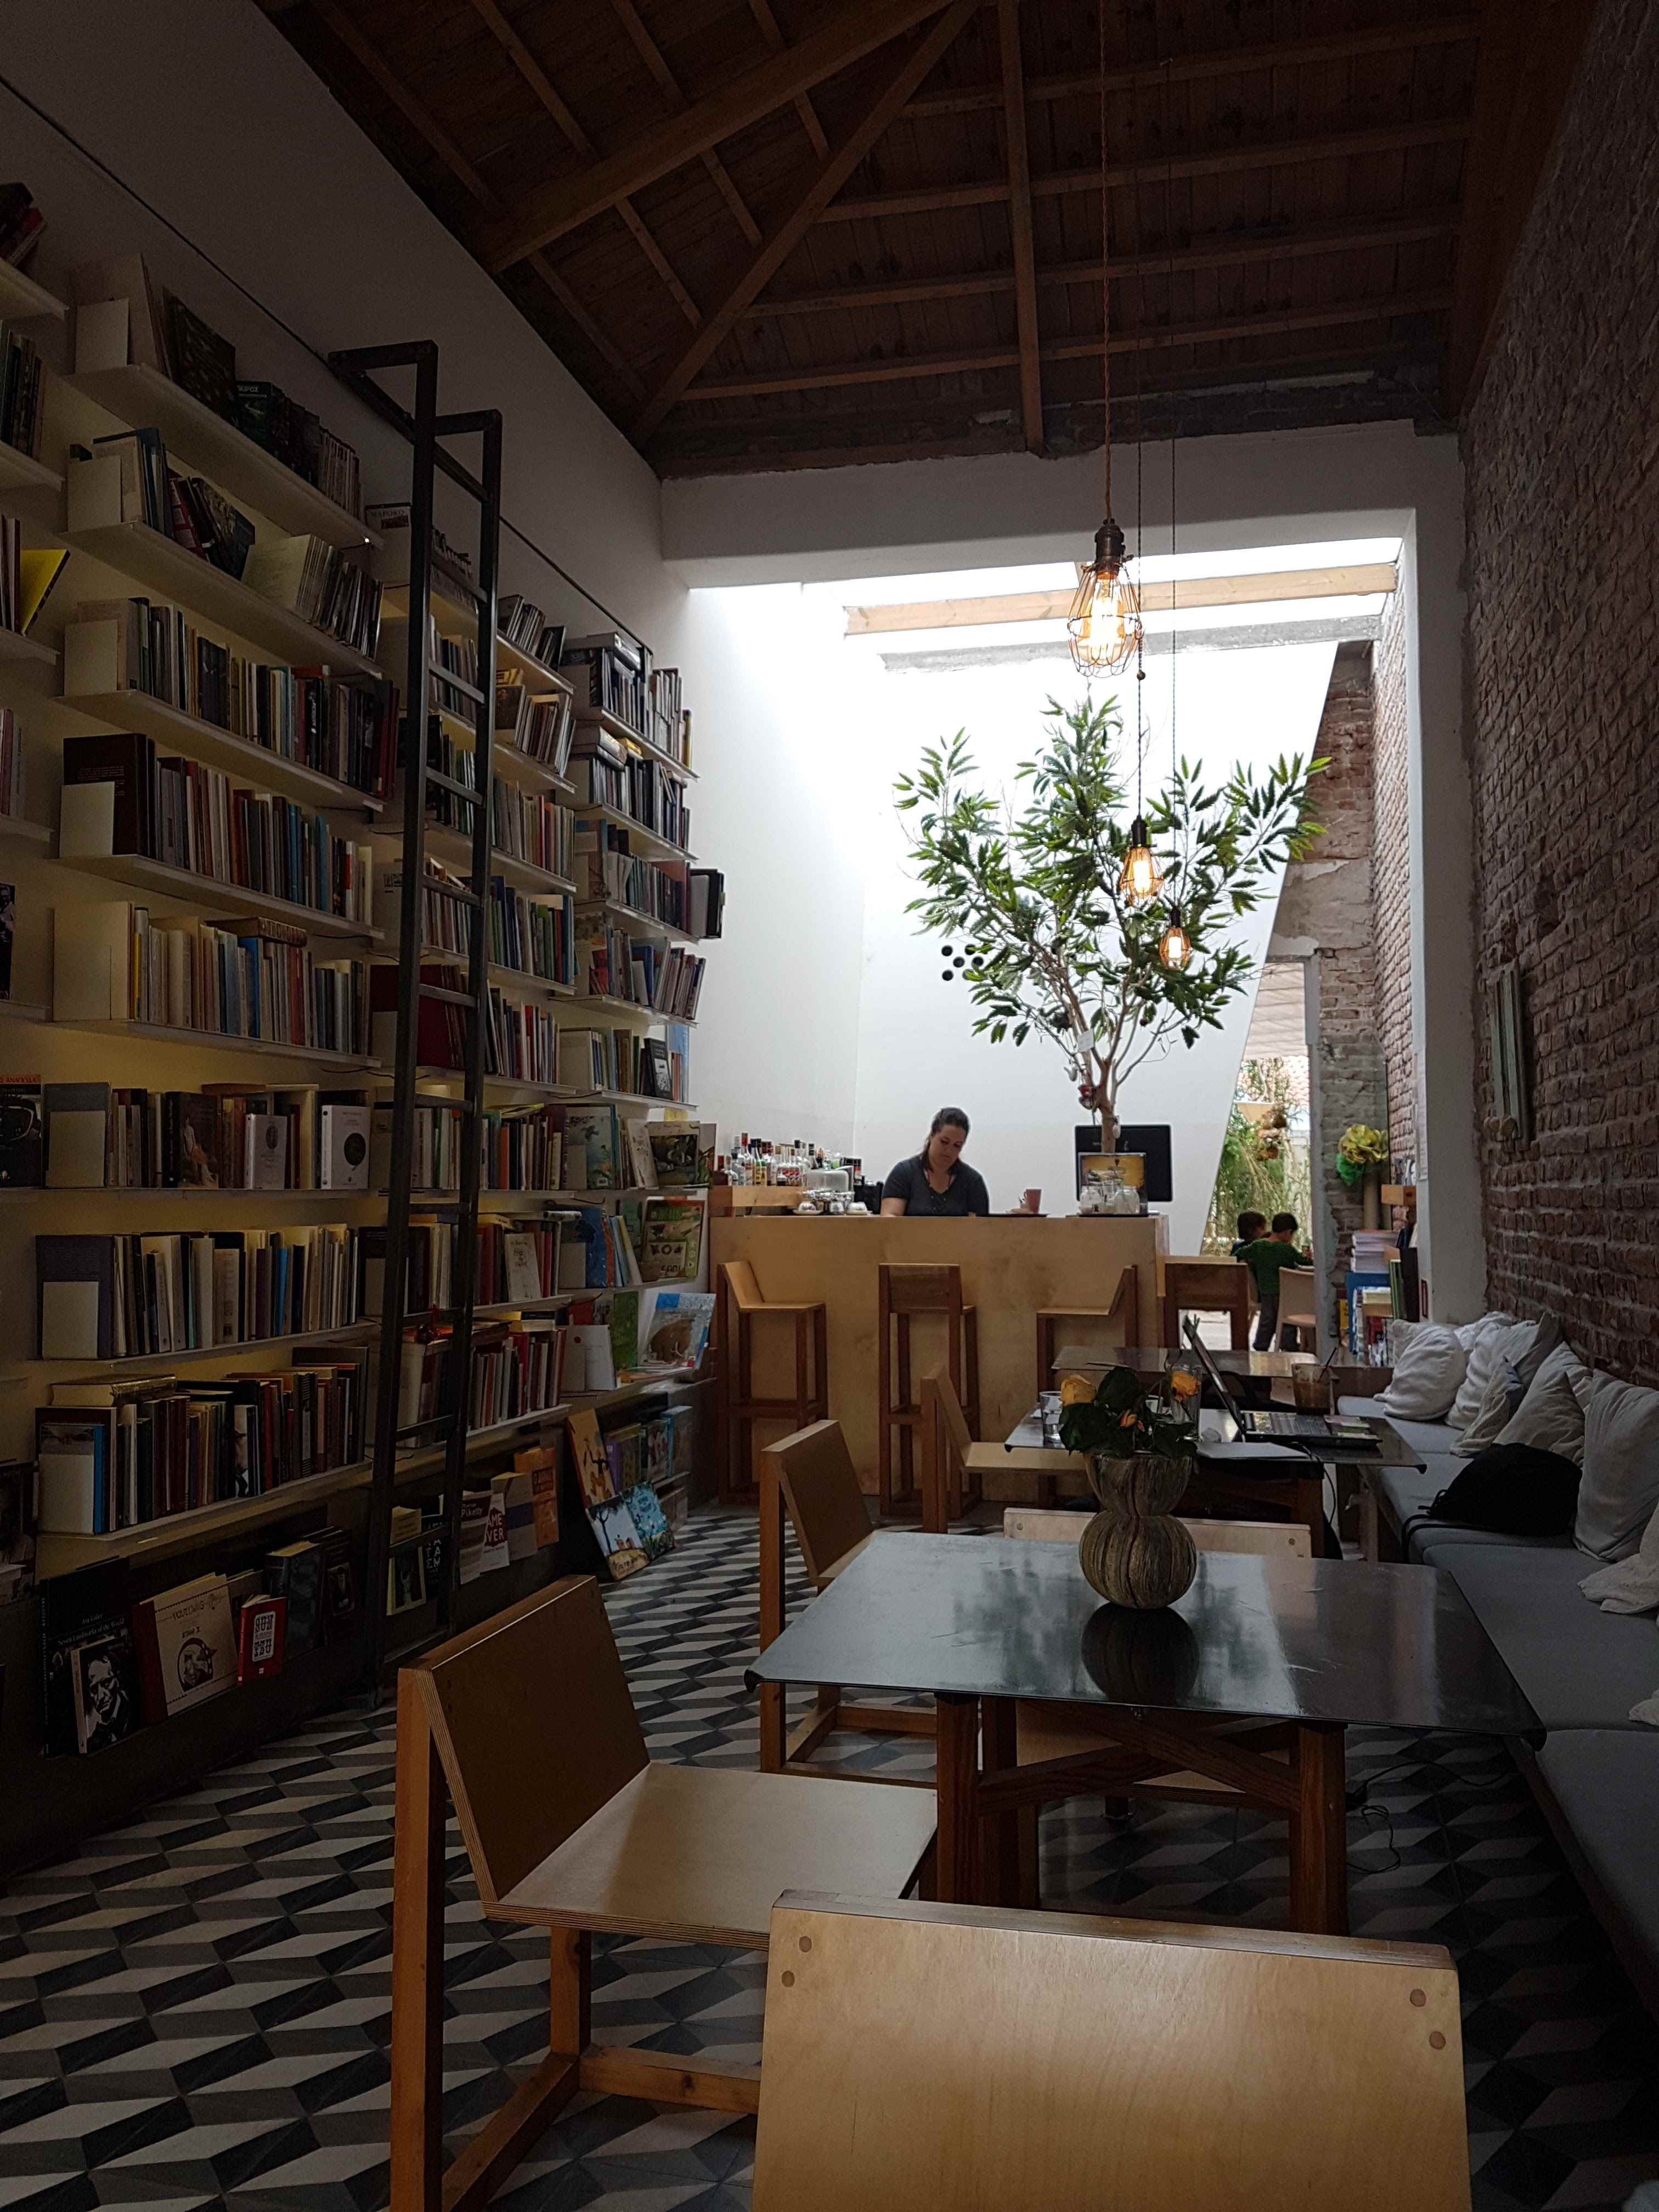 yesempatik-alexandroupoli-mekan-rehberi-yeme-icme-kafka-bookstore